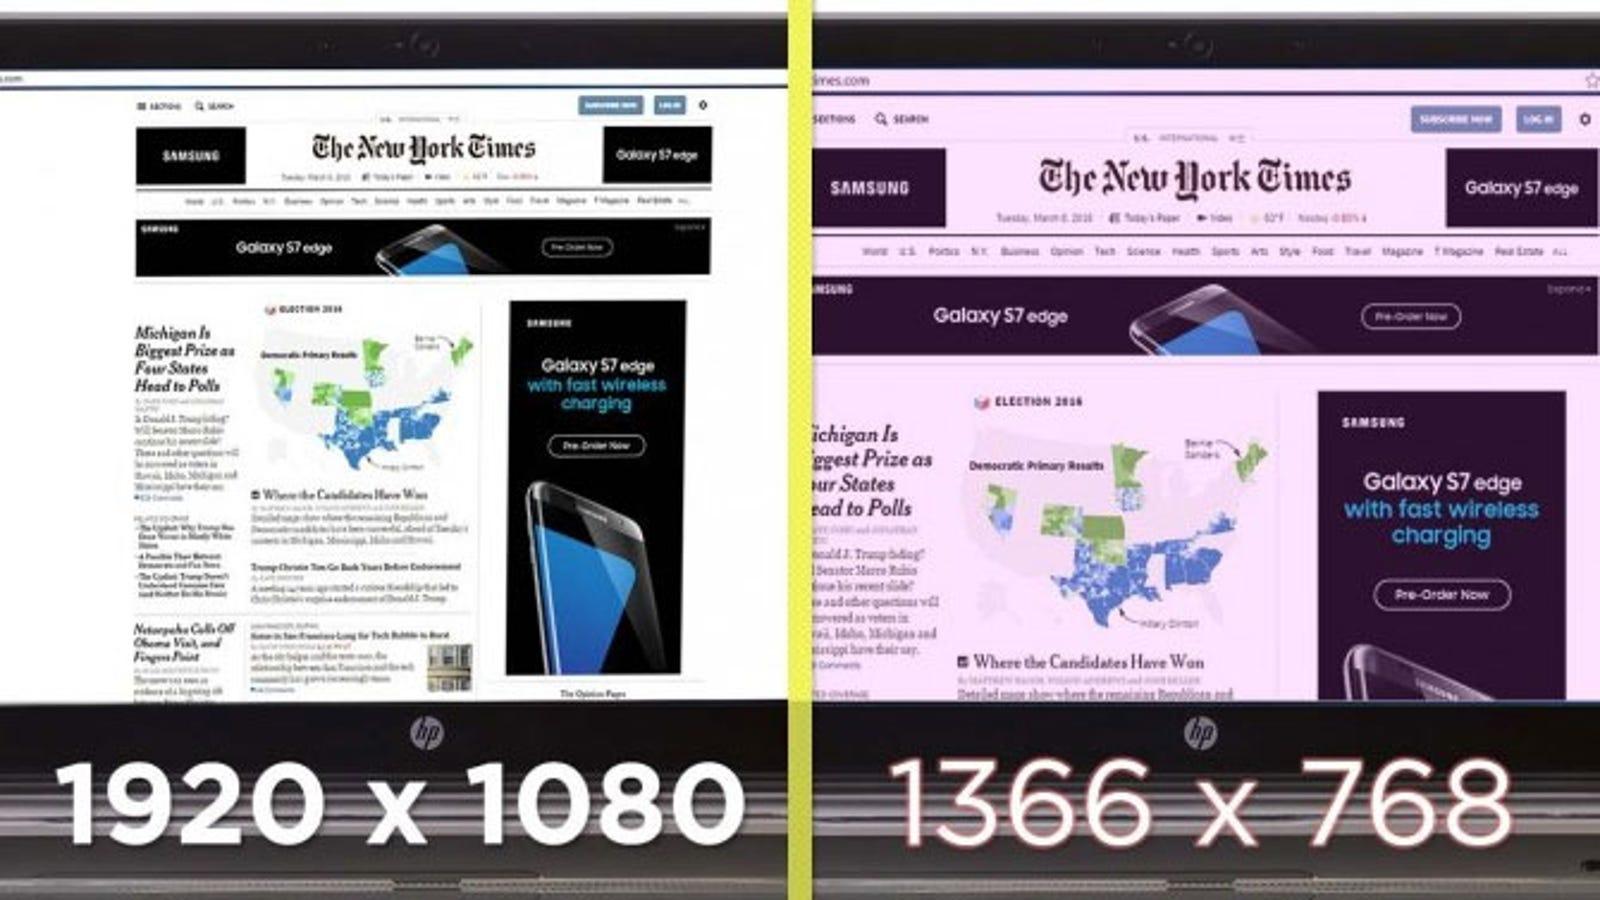 1366x768 Resolution vs. 1920x1080 Resolution